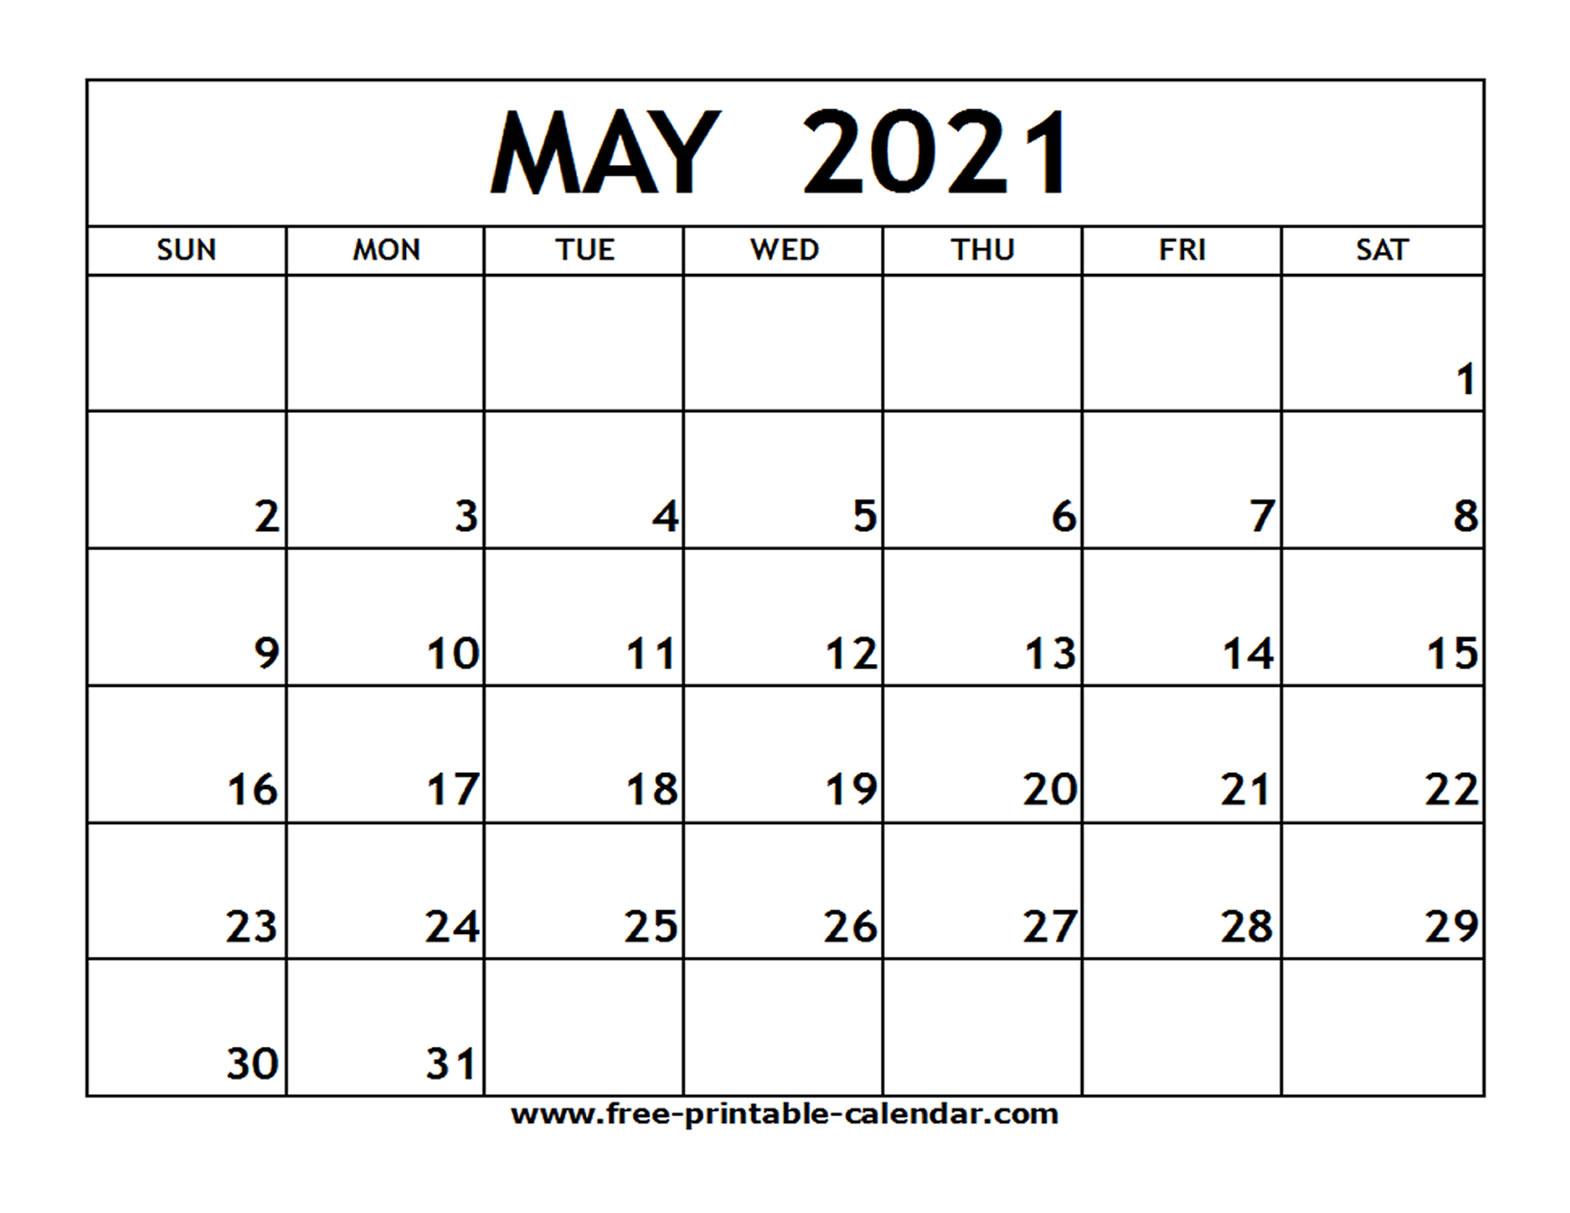 Printable May Schedule 2021   Free Printable Calendar pertaining to Google Printable Monthly Calendar 2021